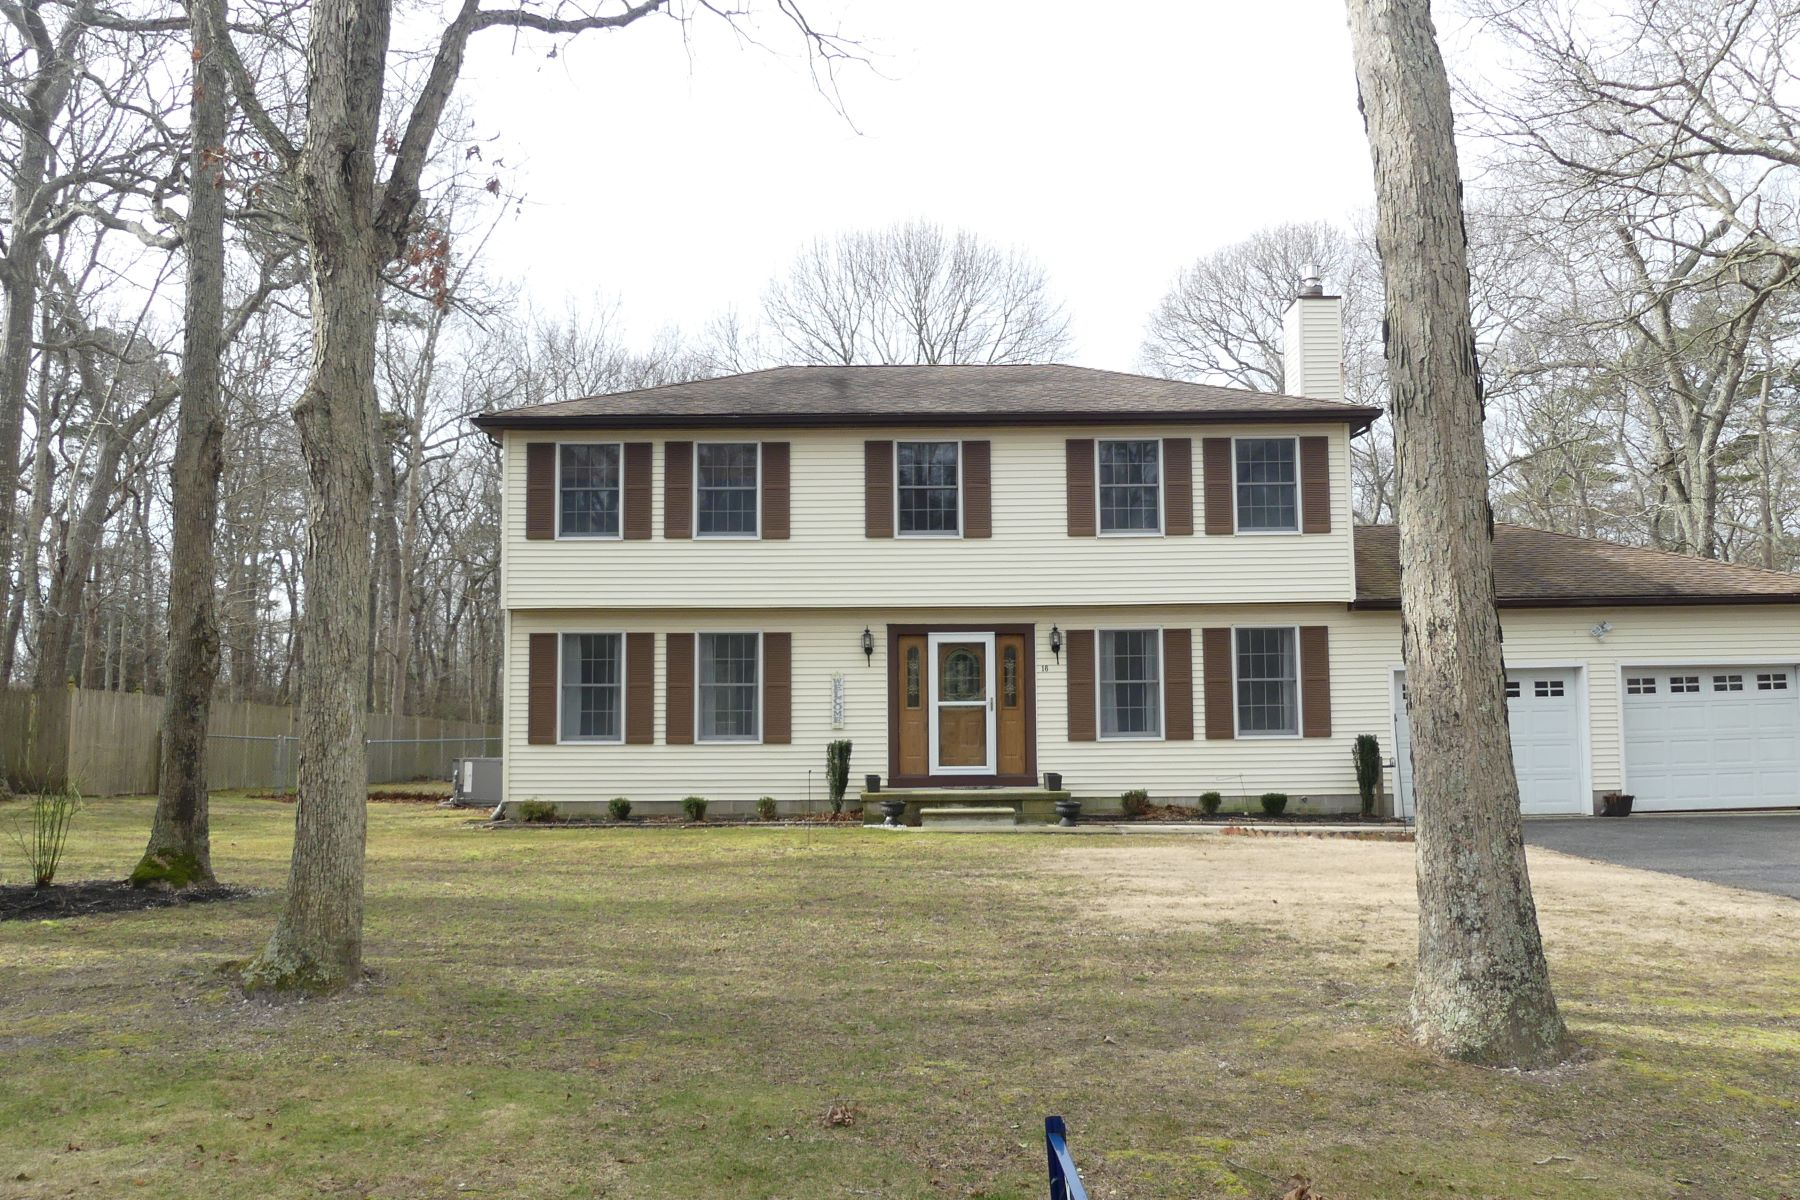 Single Family Homes для того Продажа на Upper Township Single Family Home 16 Island View Terrace, Seaville, Нью-Джерси 08230 Соединенные Штаты